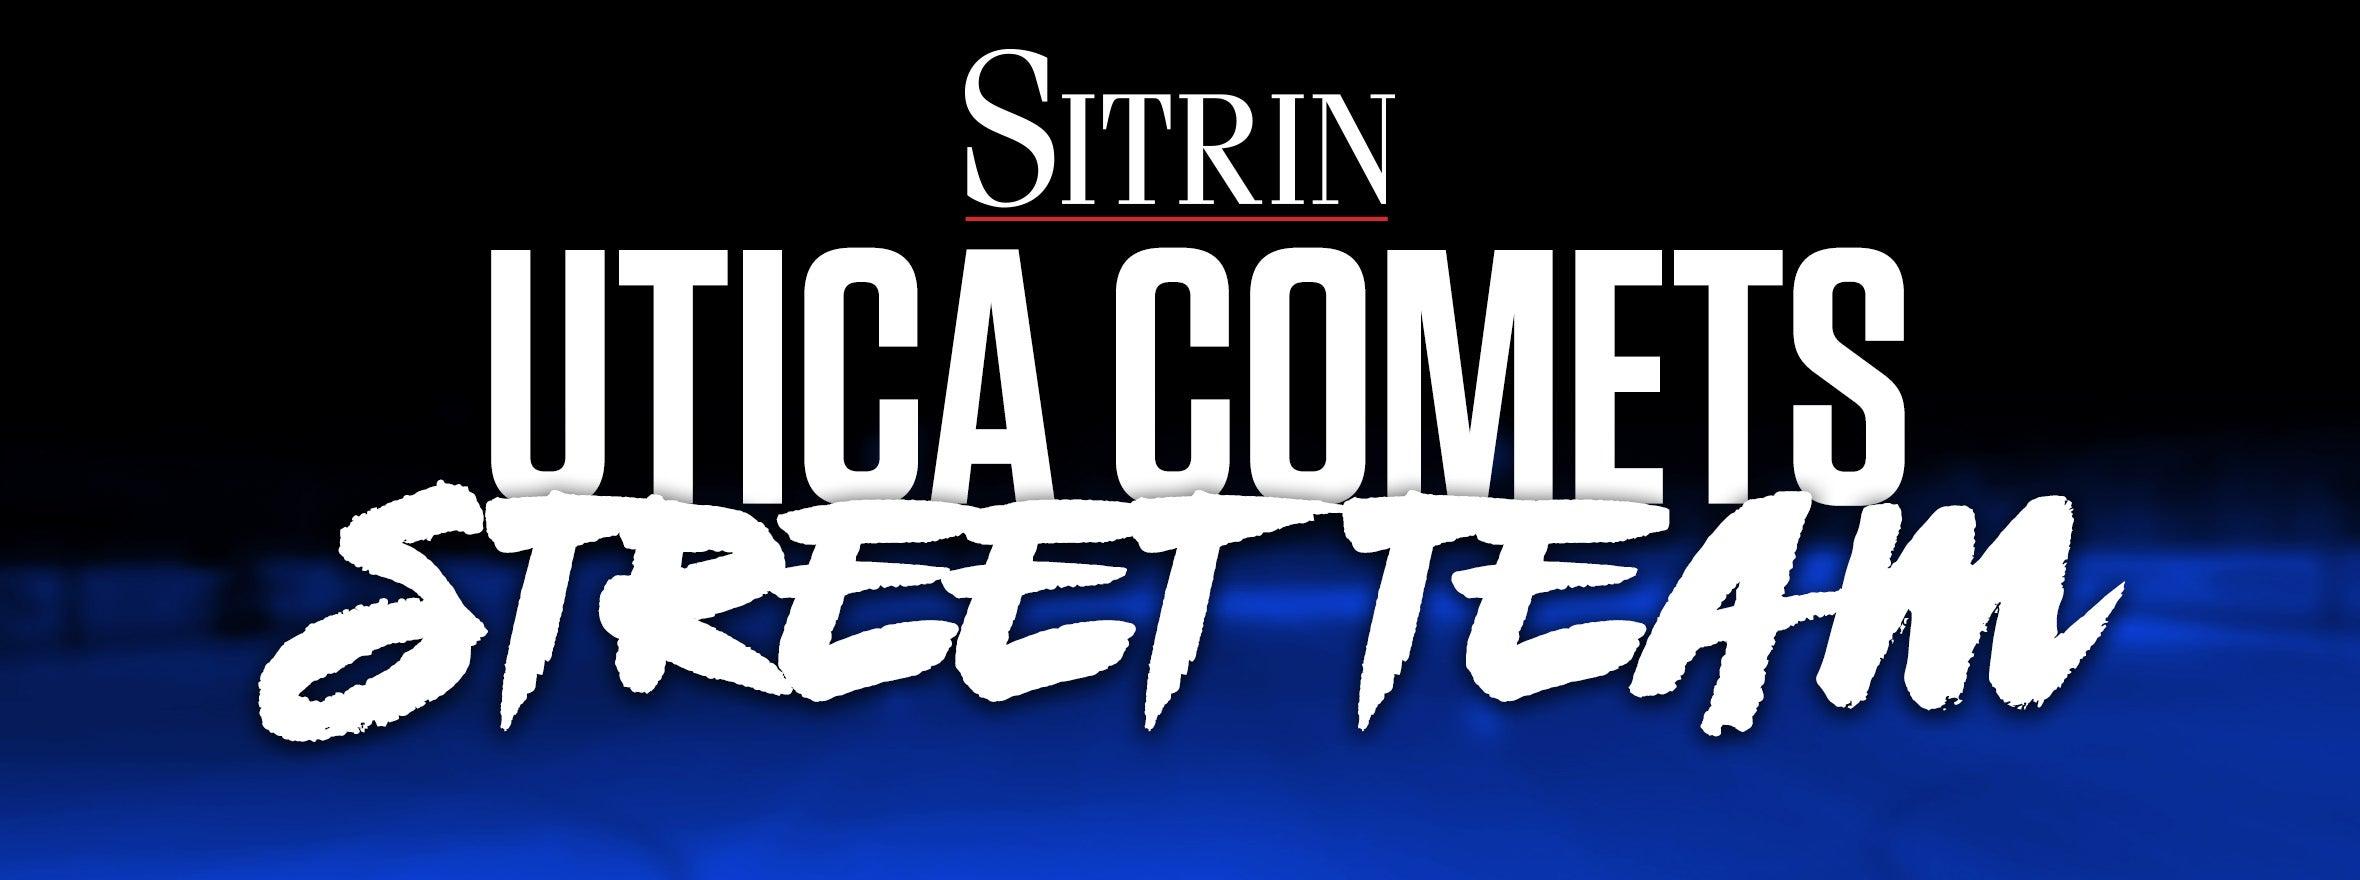 COMETS ADD RAINMAN AND SITRIN STREET TEAM